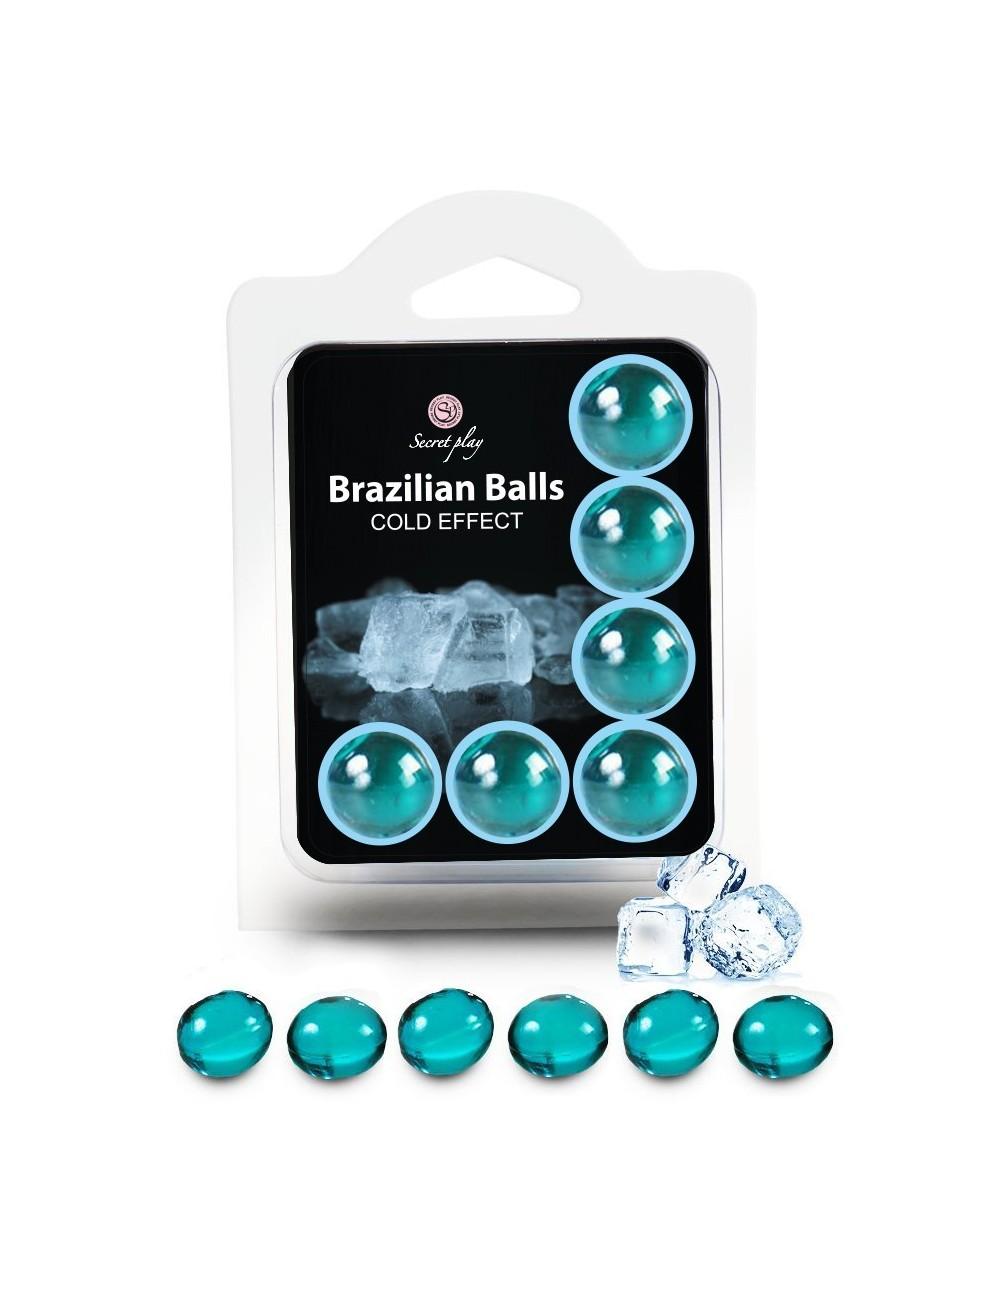 6 Brazilian Balls Cold effect 3613-1 - Huiles de massage - Brazilian Balls